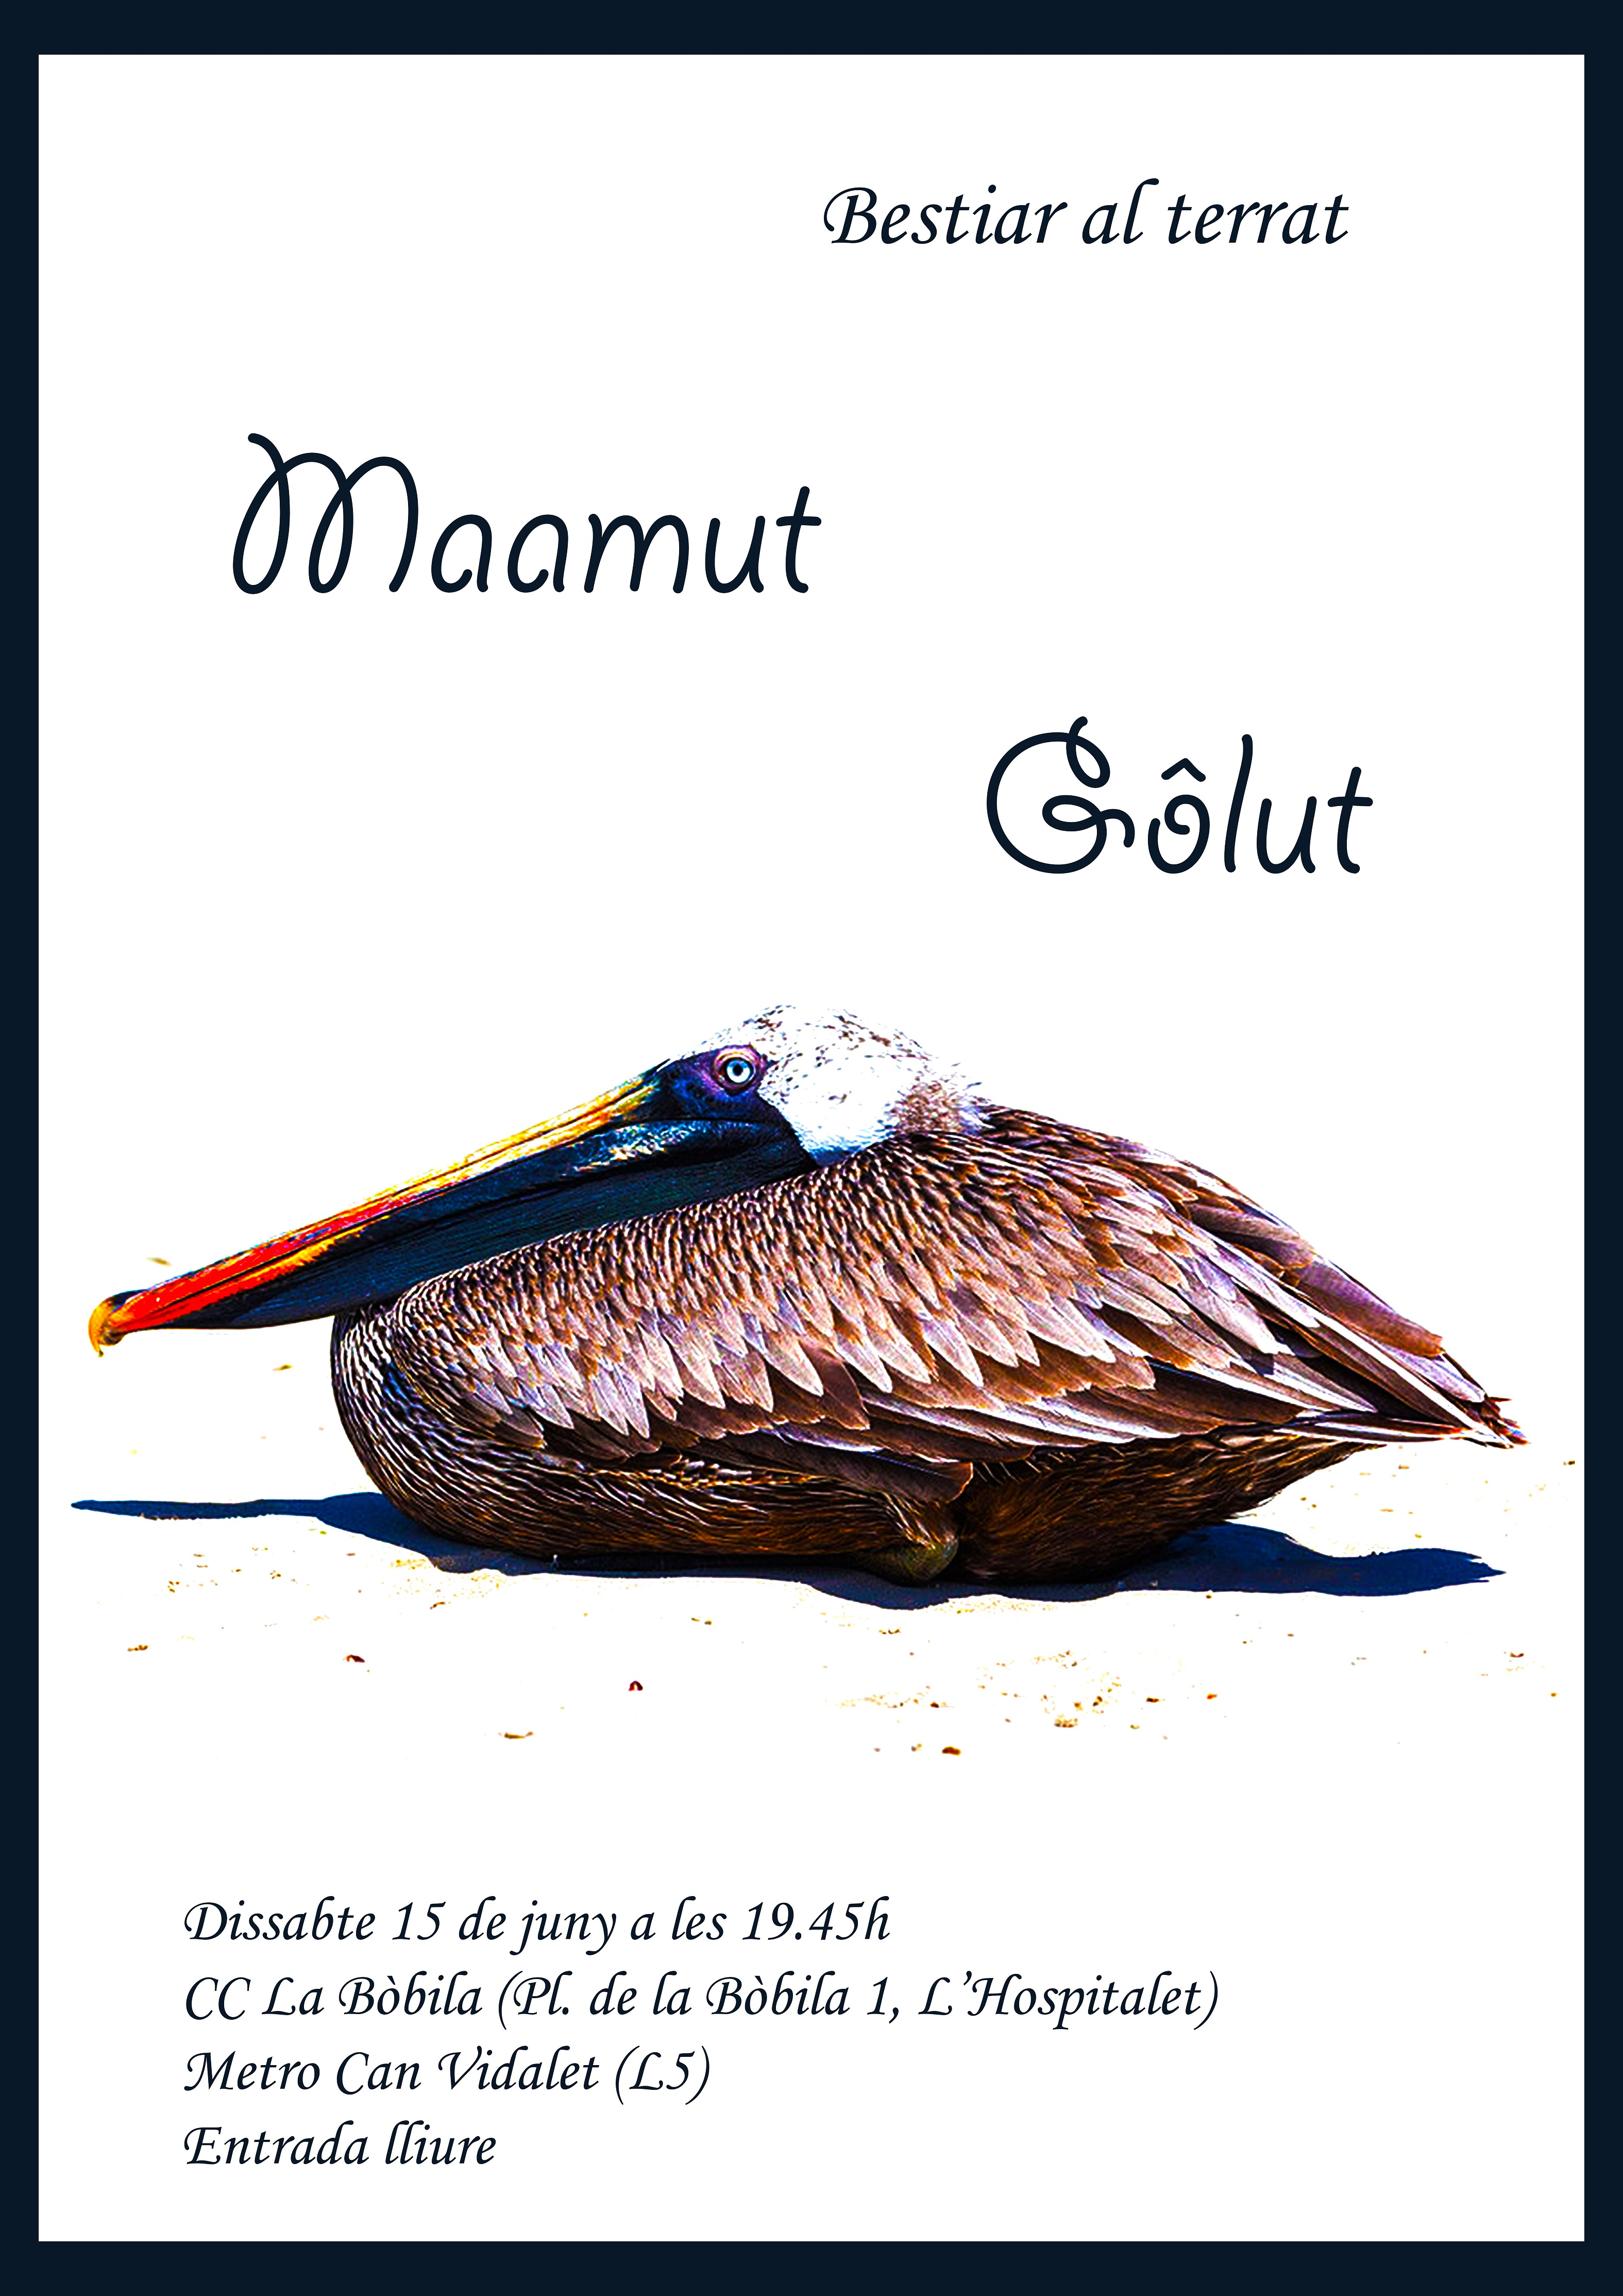 Maamut; Gôlut; Bestiar Universal; Bestiar Netlabel; CC La Bòbila